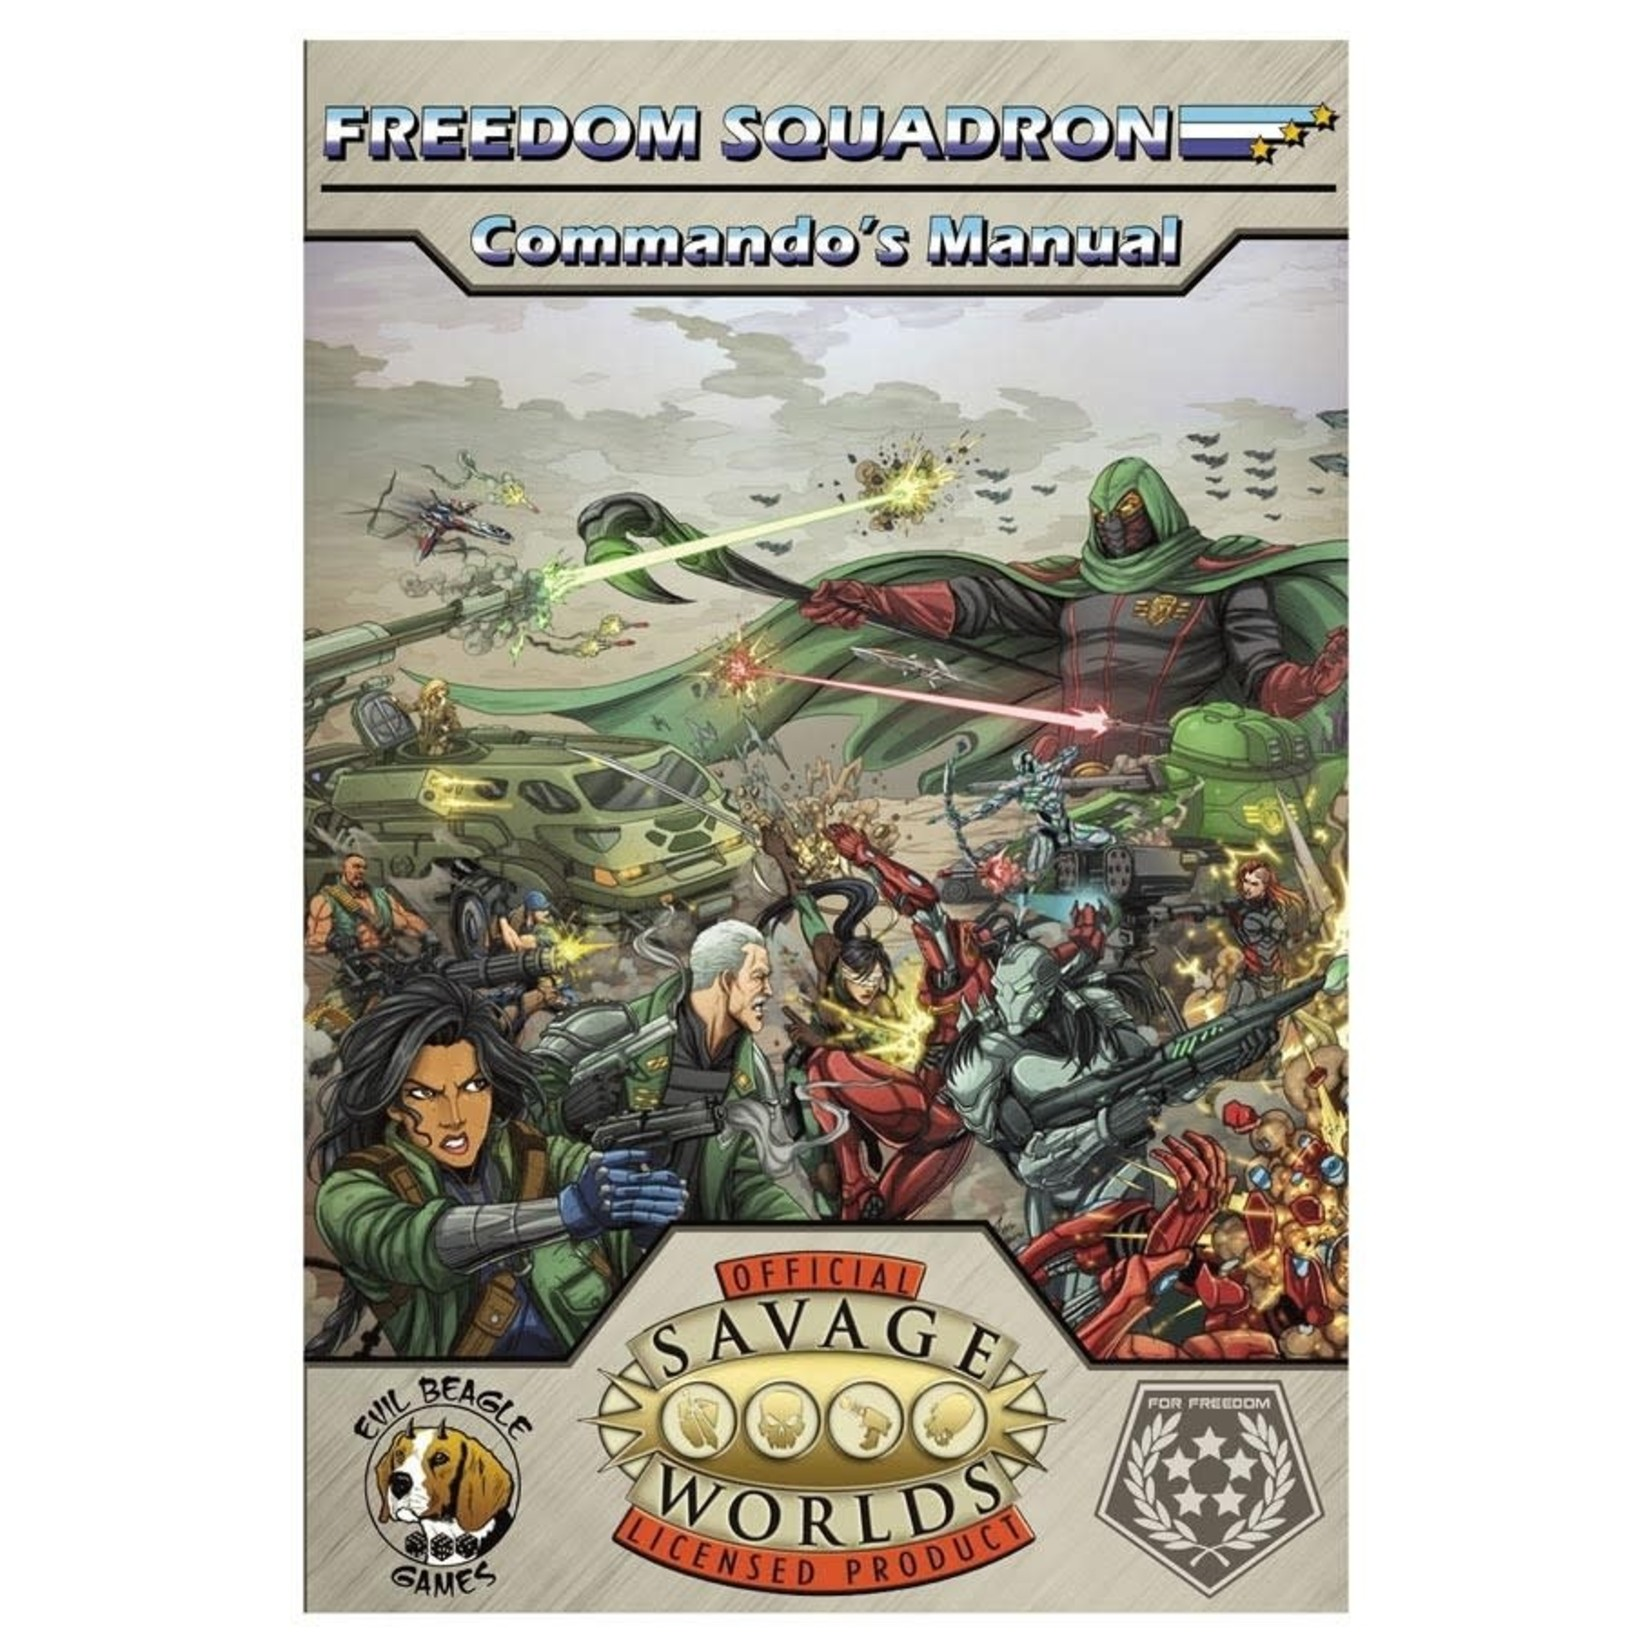 Savage Worlds Freedom Squadron Commando Manual